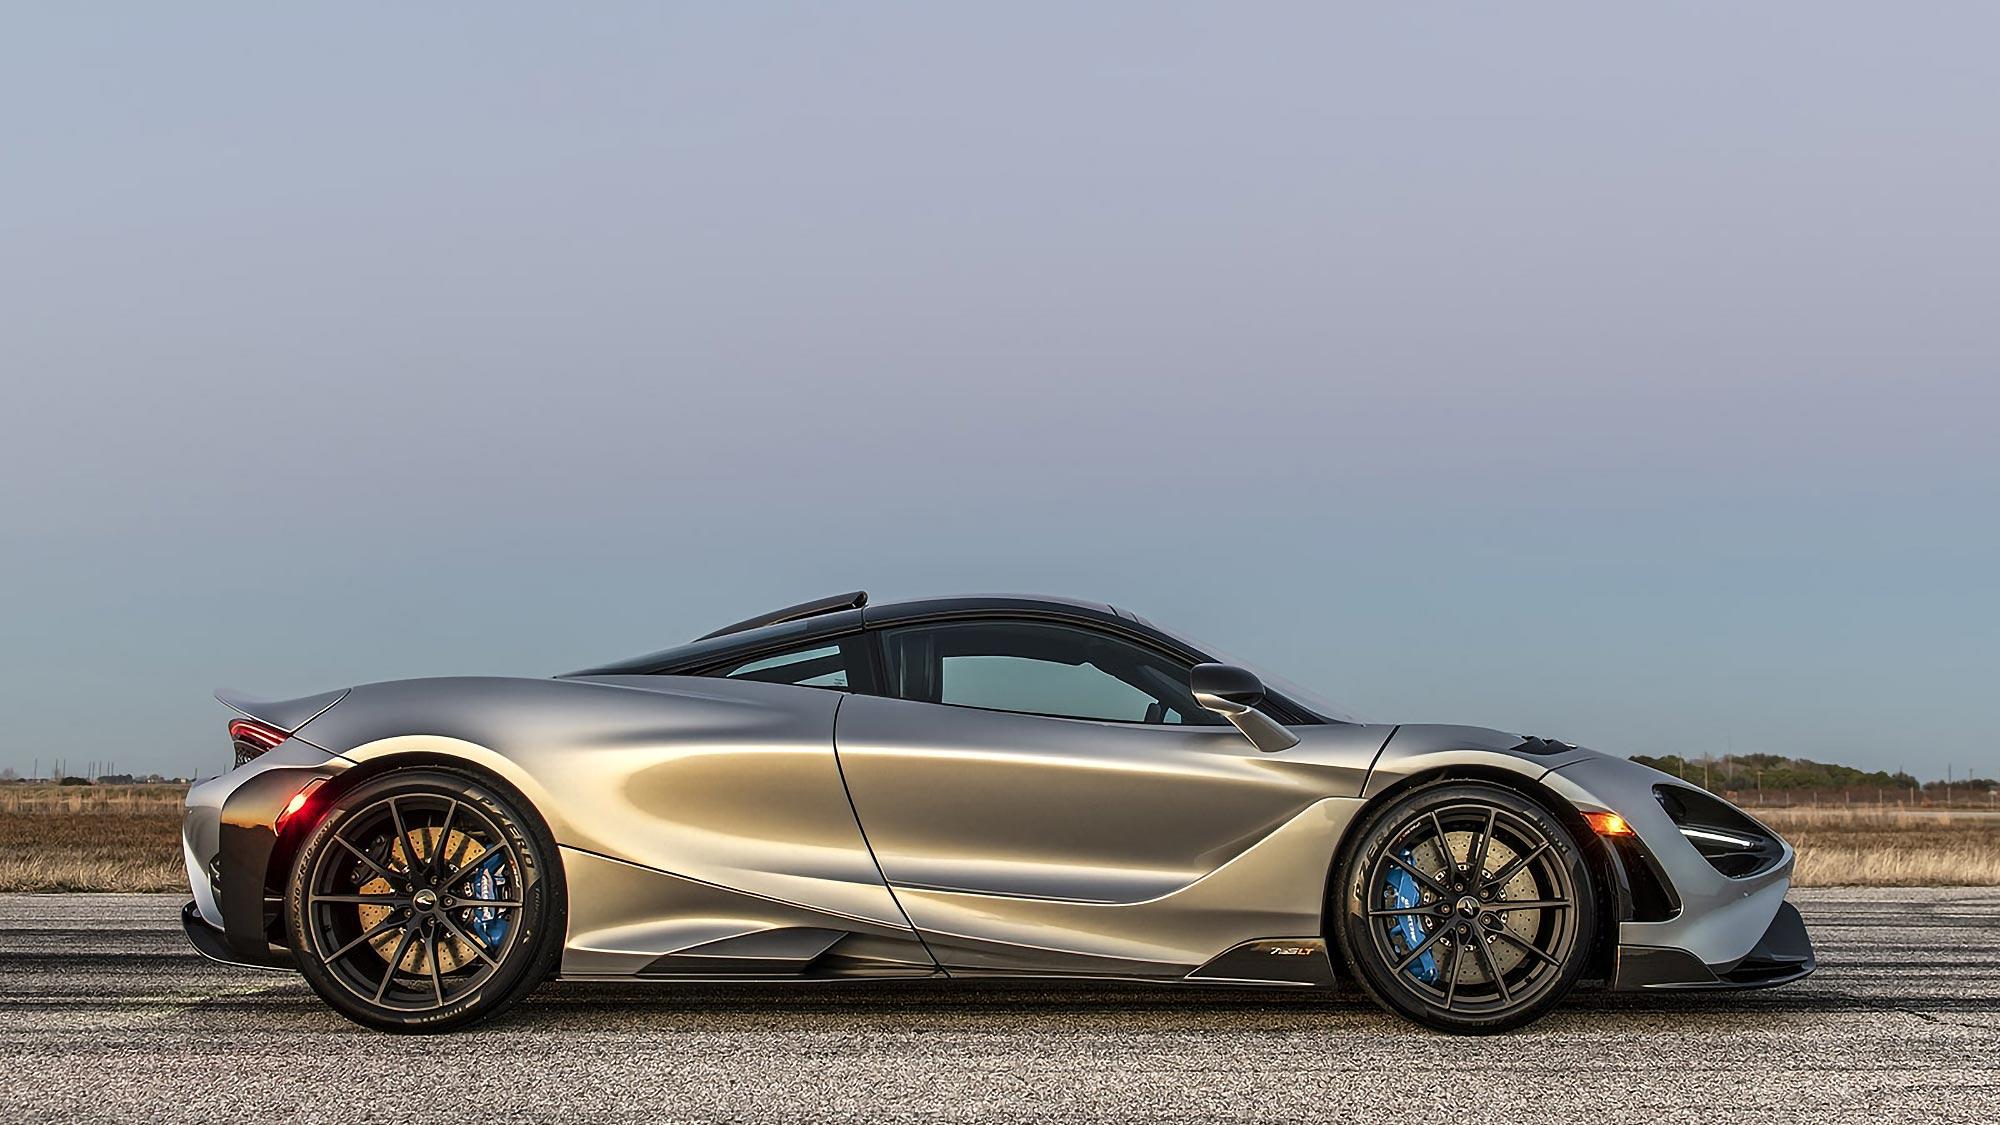 Hennessey HPE1000 for McLaren 765LT Supercar